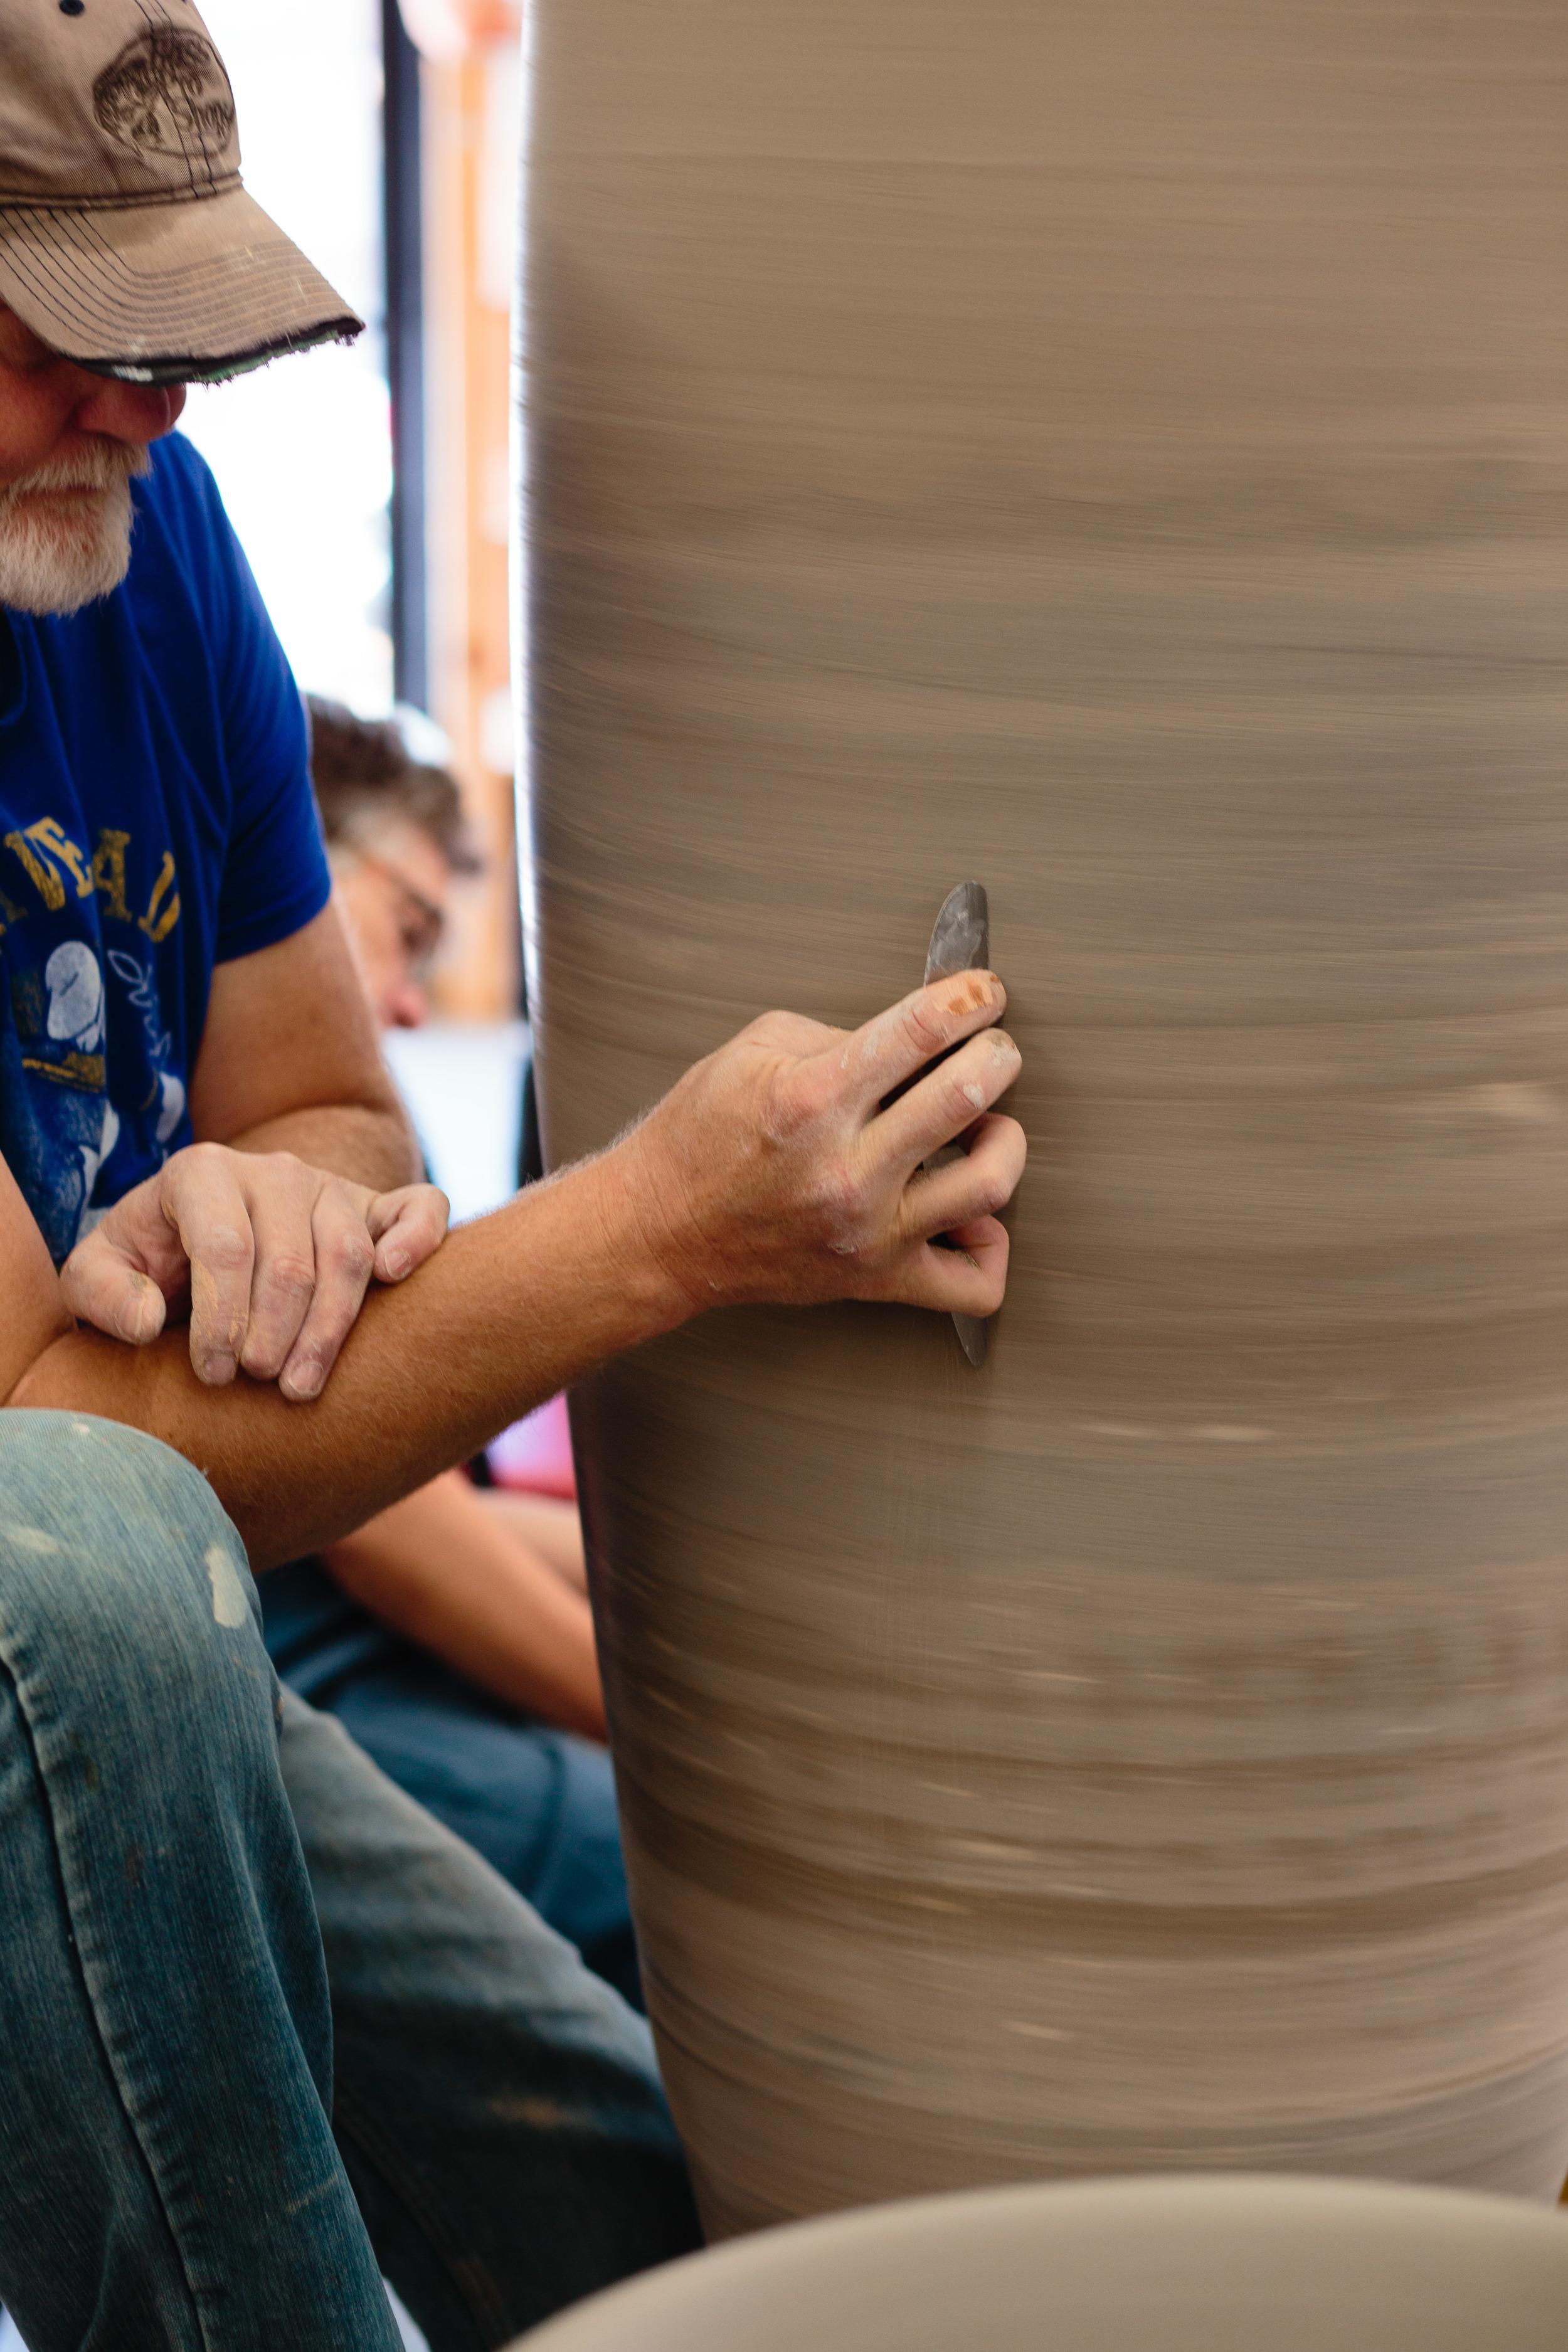 Artist Potter smoothing pot